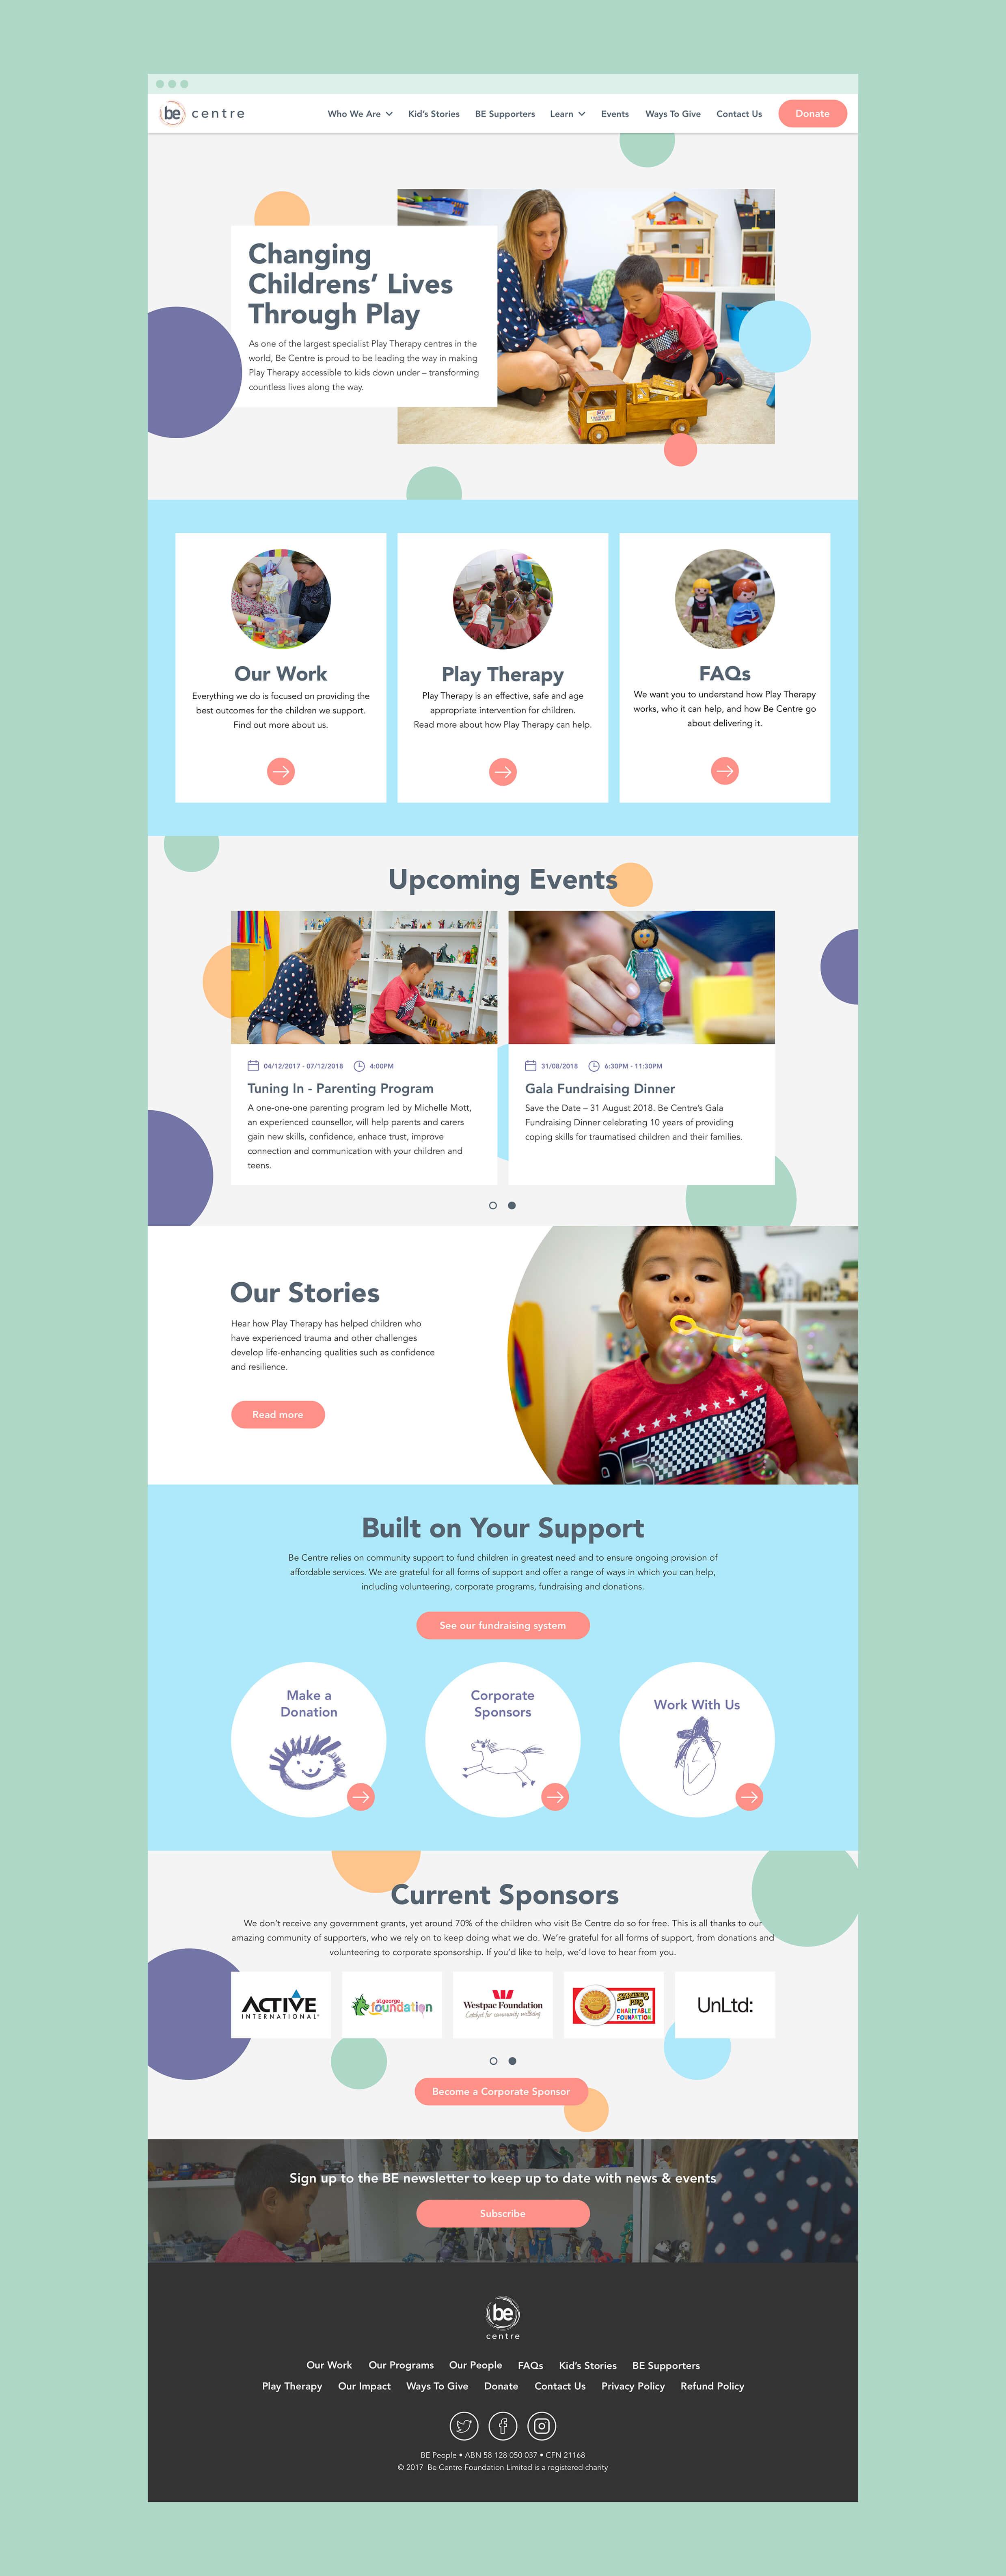 be-centre-homepage.jpg